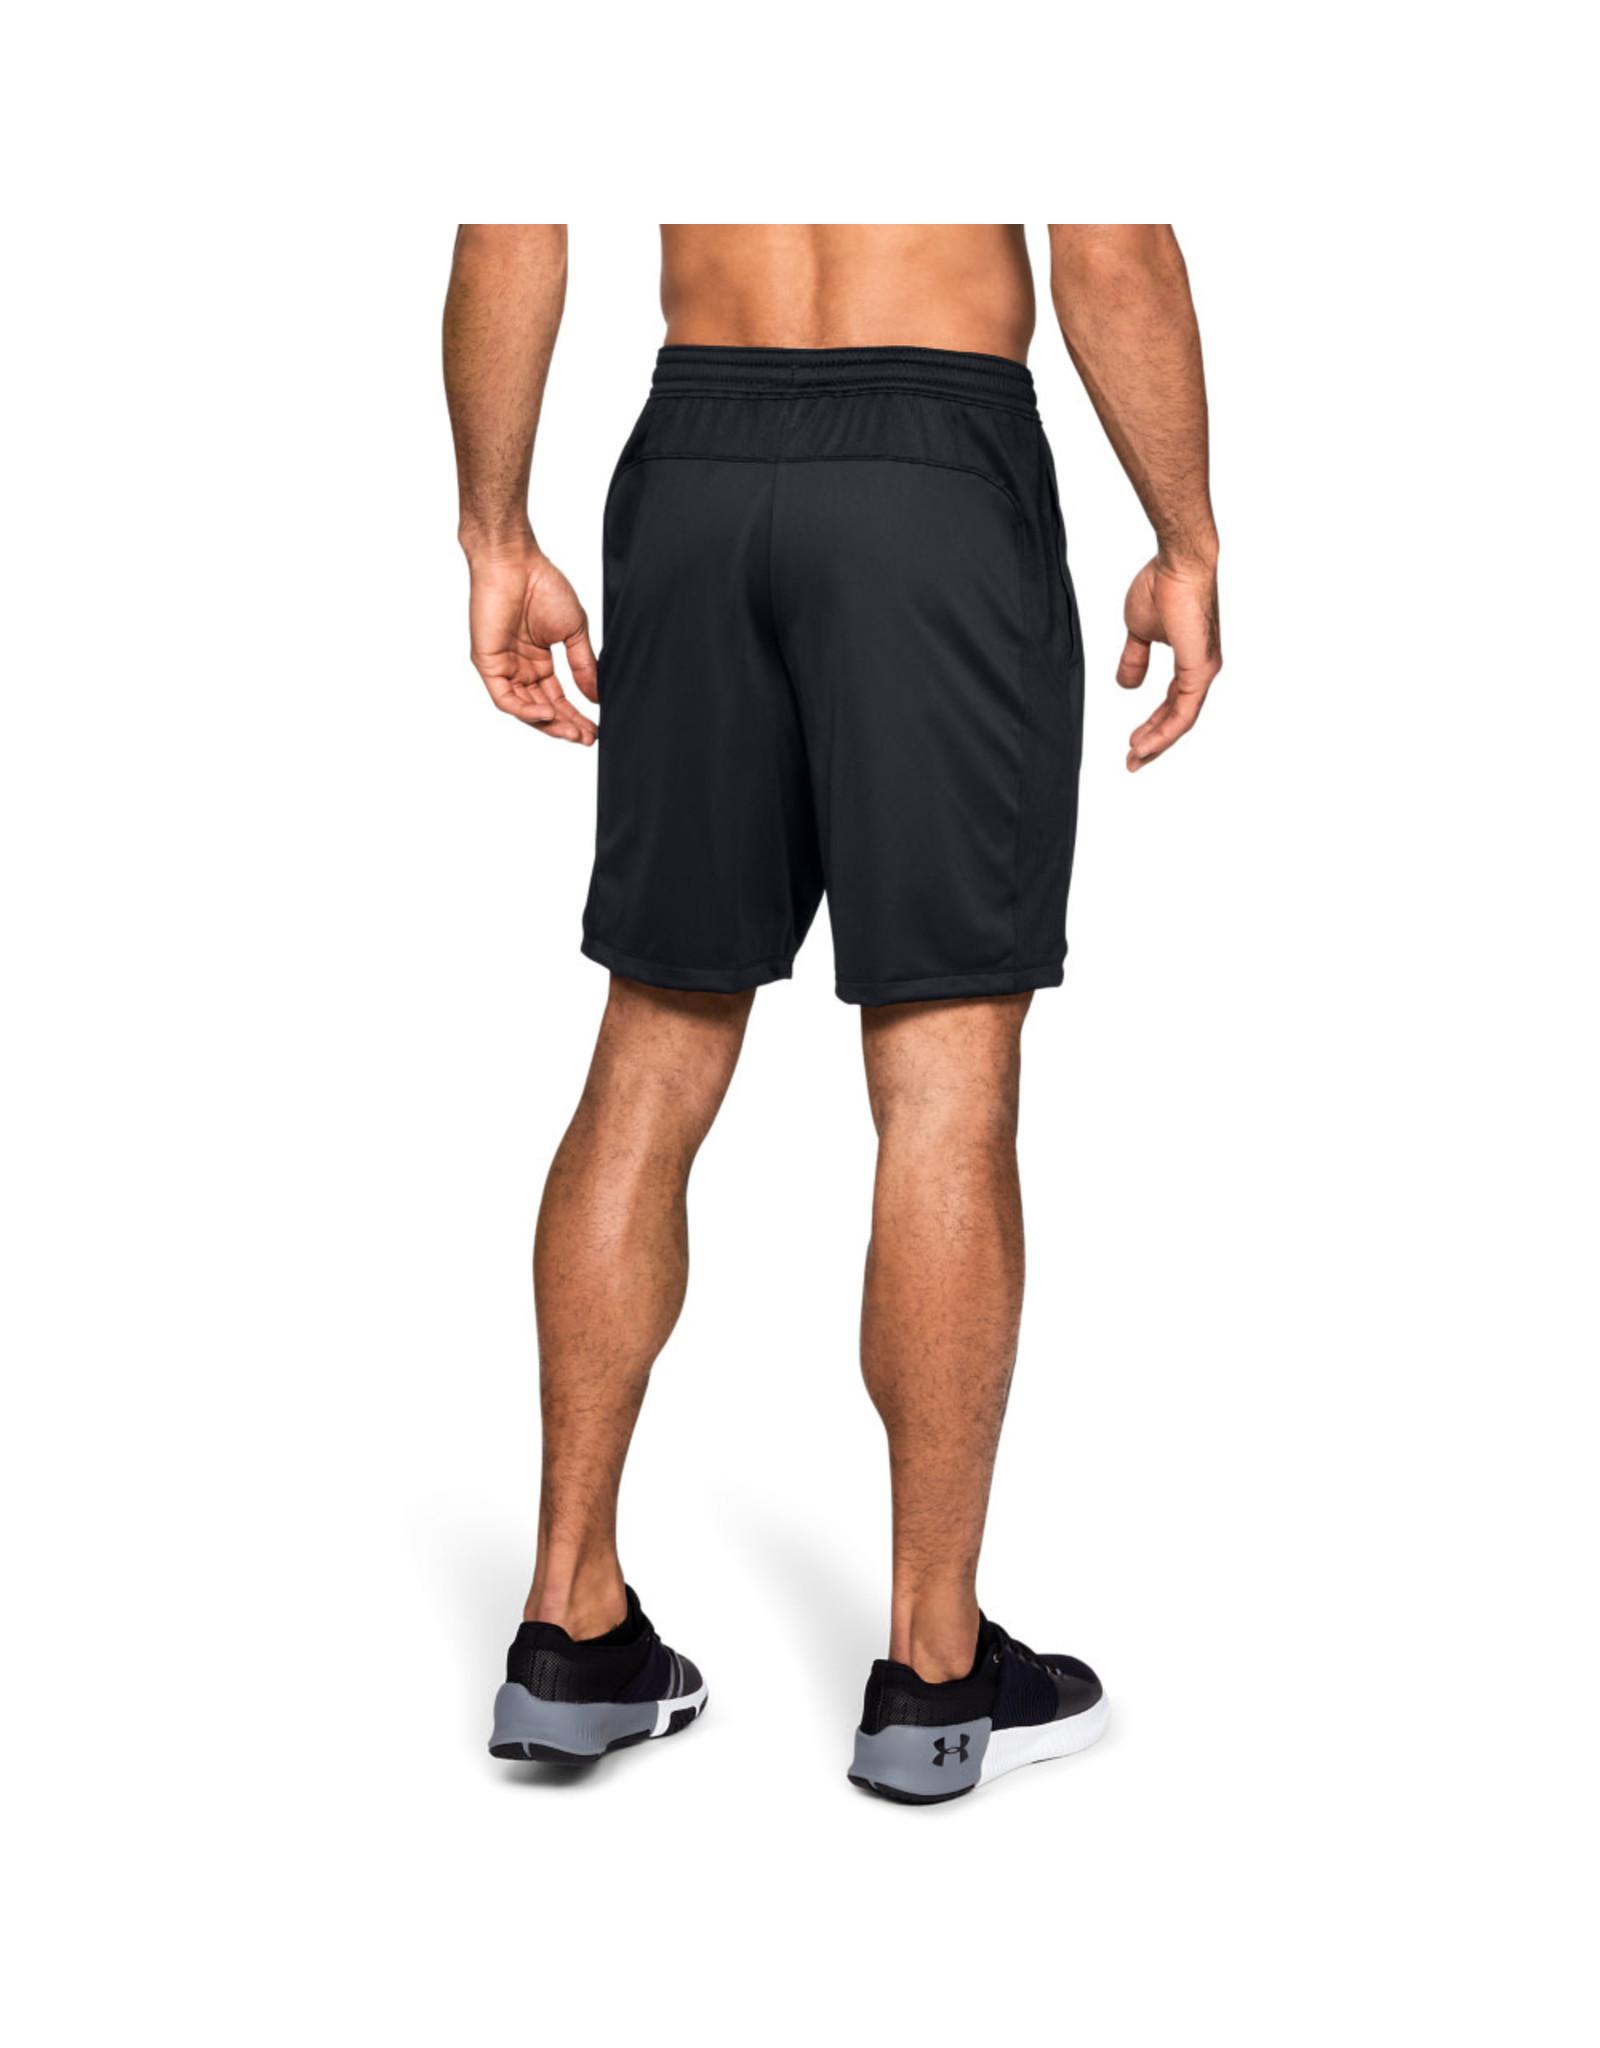 Under Armour UA MK-1 Shorts - Black-Black-STEALTH GRAY